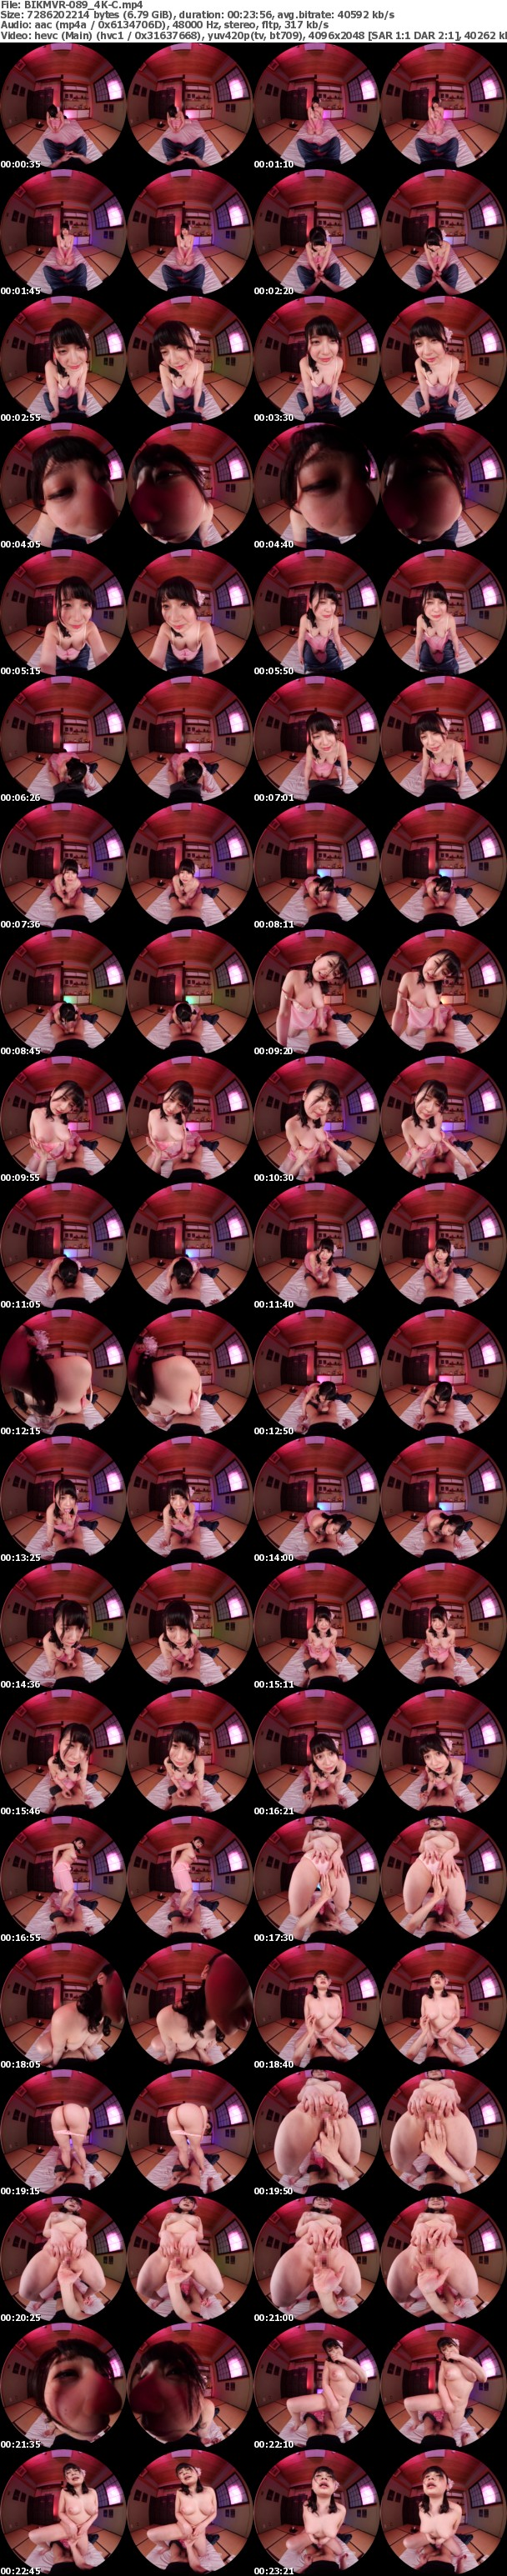 (VR) BIKMVR-089 【4K匠】激アツ激安の手コキオナクラ専門店で超プレミアムガールにまで上り詰めた神対応まいなちゃんのご奉仕裏オプション!! 優梨まいな